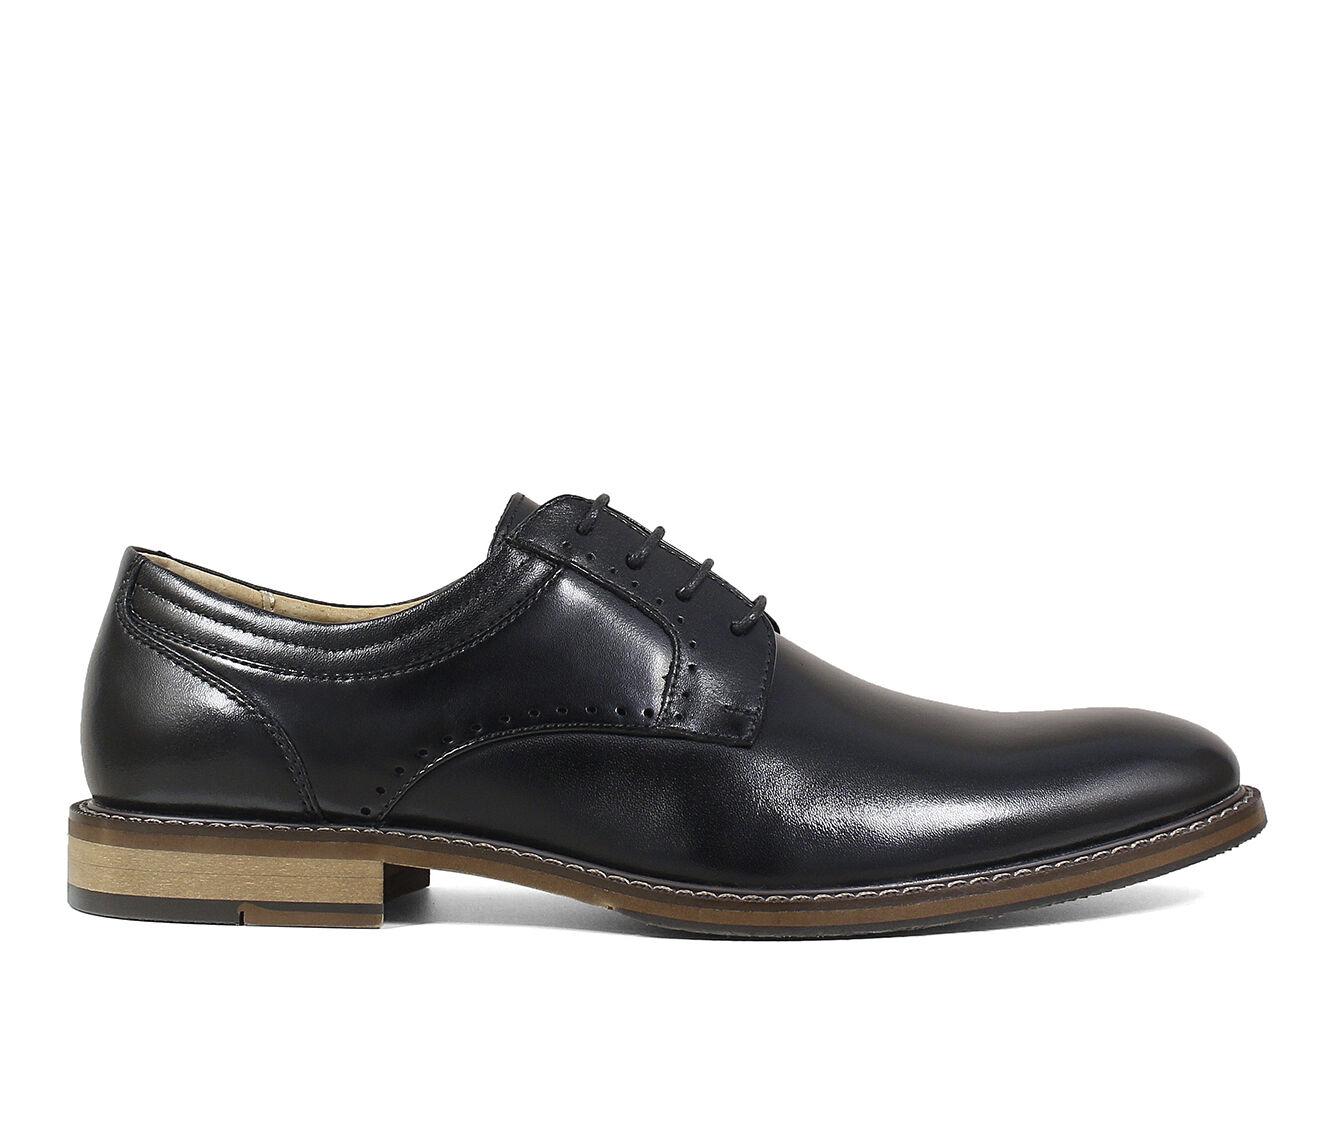 purchase cheap new Men's Stacy Adams Faulkner Dress Shoes Black